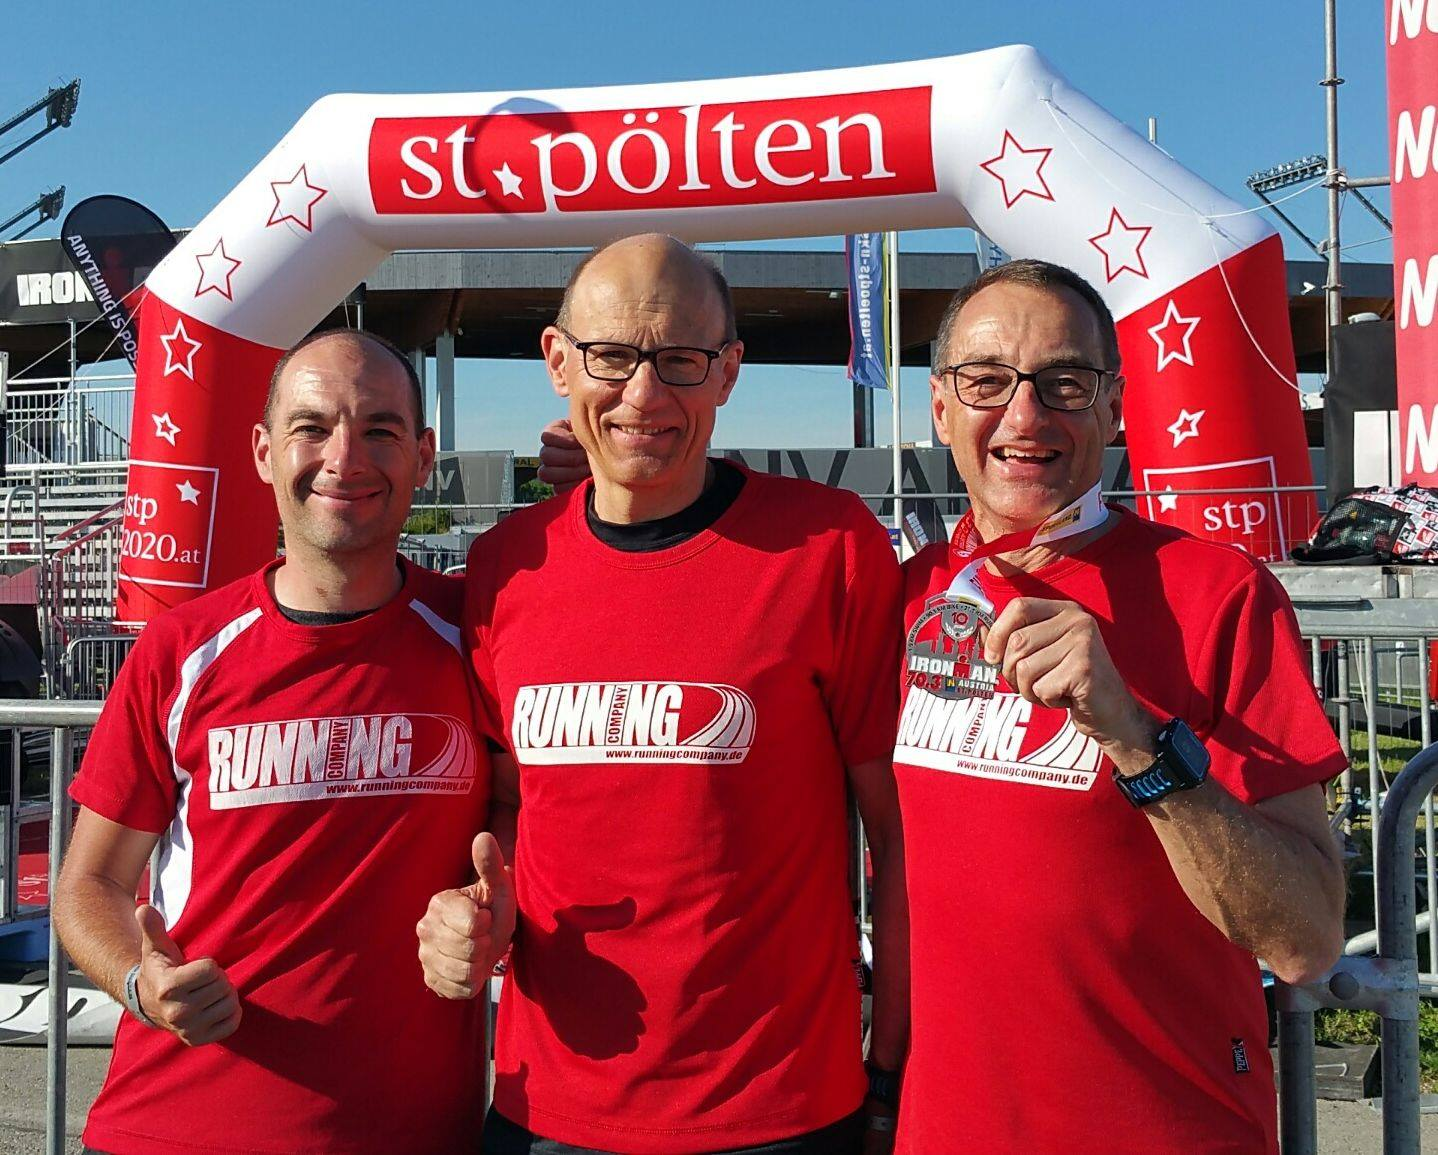 RUNNING Company Triathleten in St. Pölten